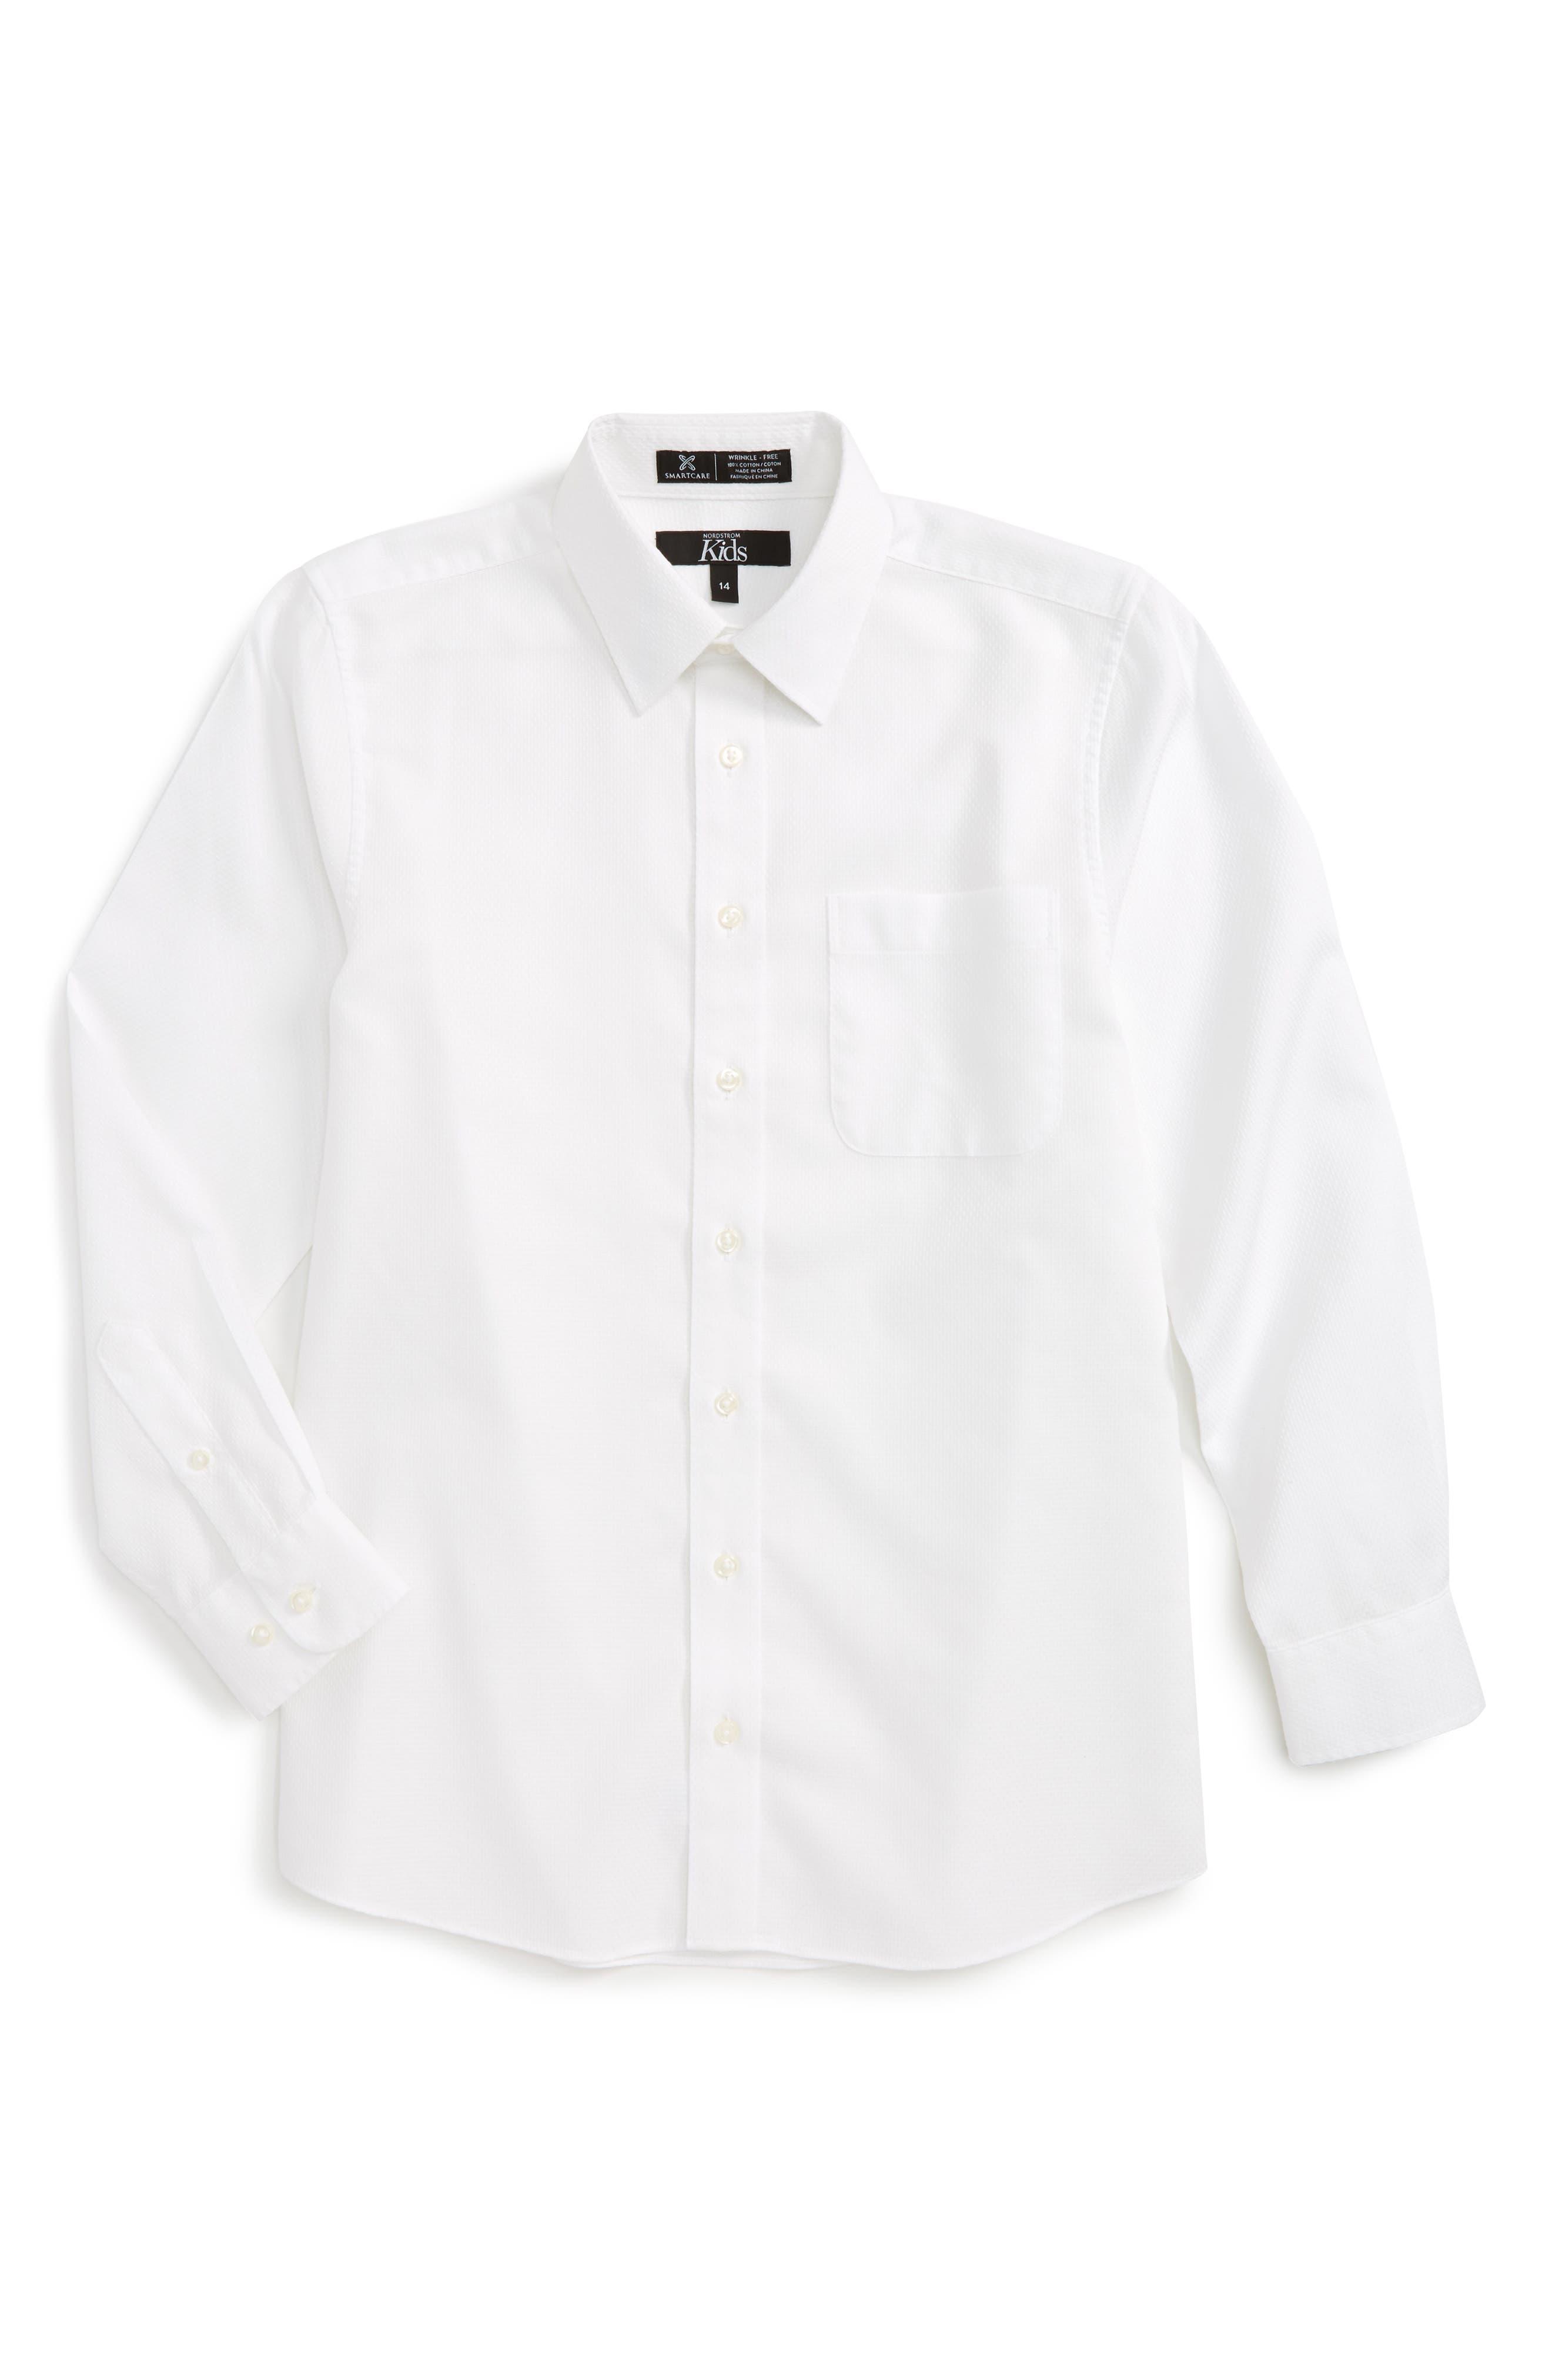 Smartcare<sup>™</sup> Honeycomb Dress Shirt,                         Main,                         color, White Honeycomb